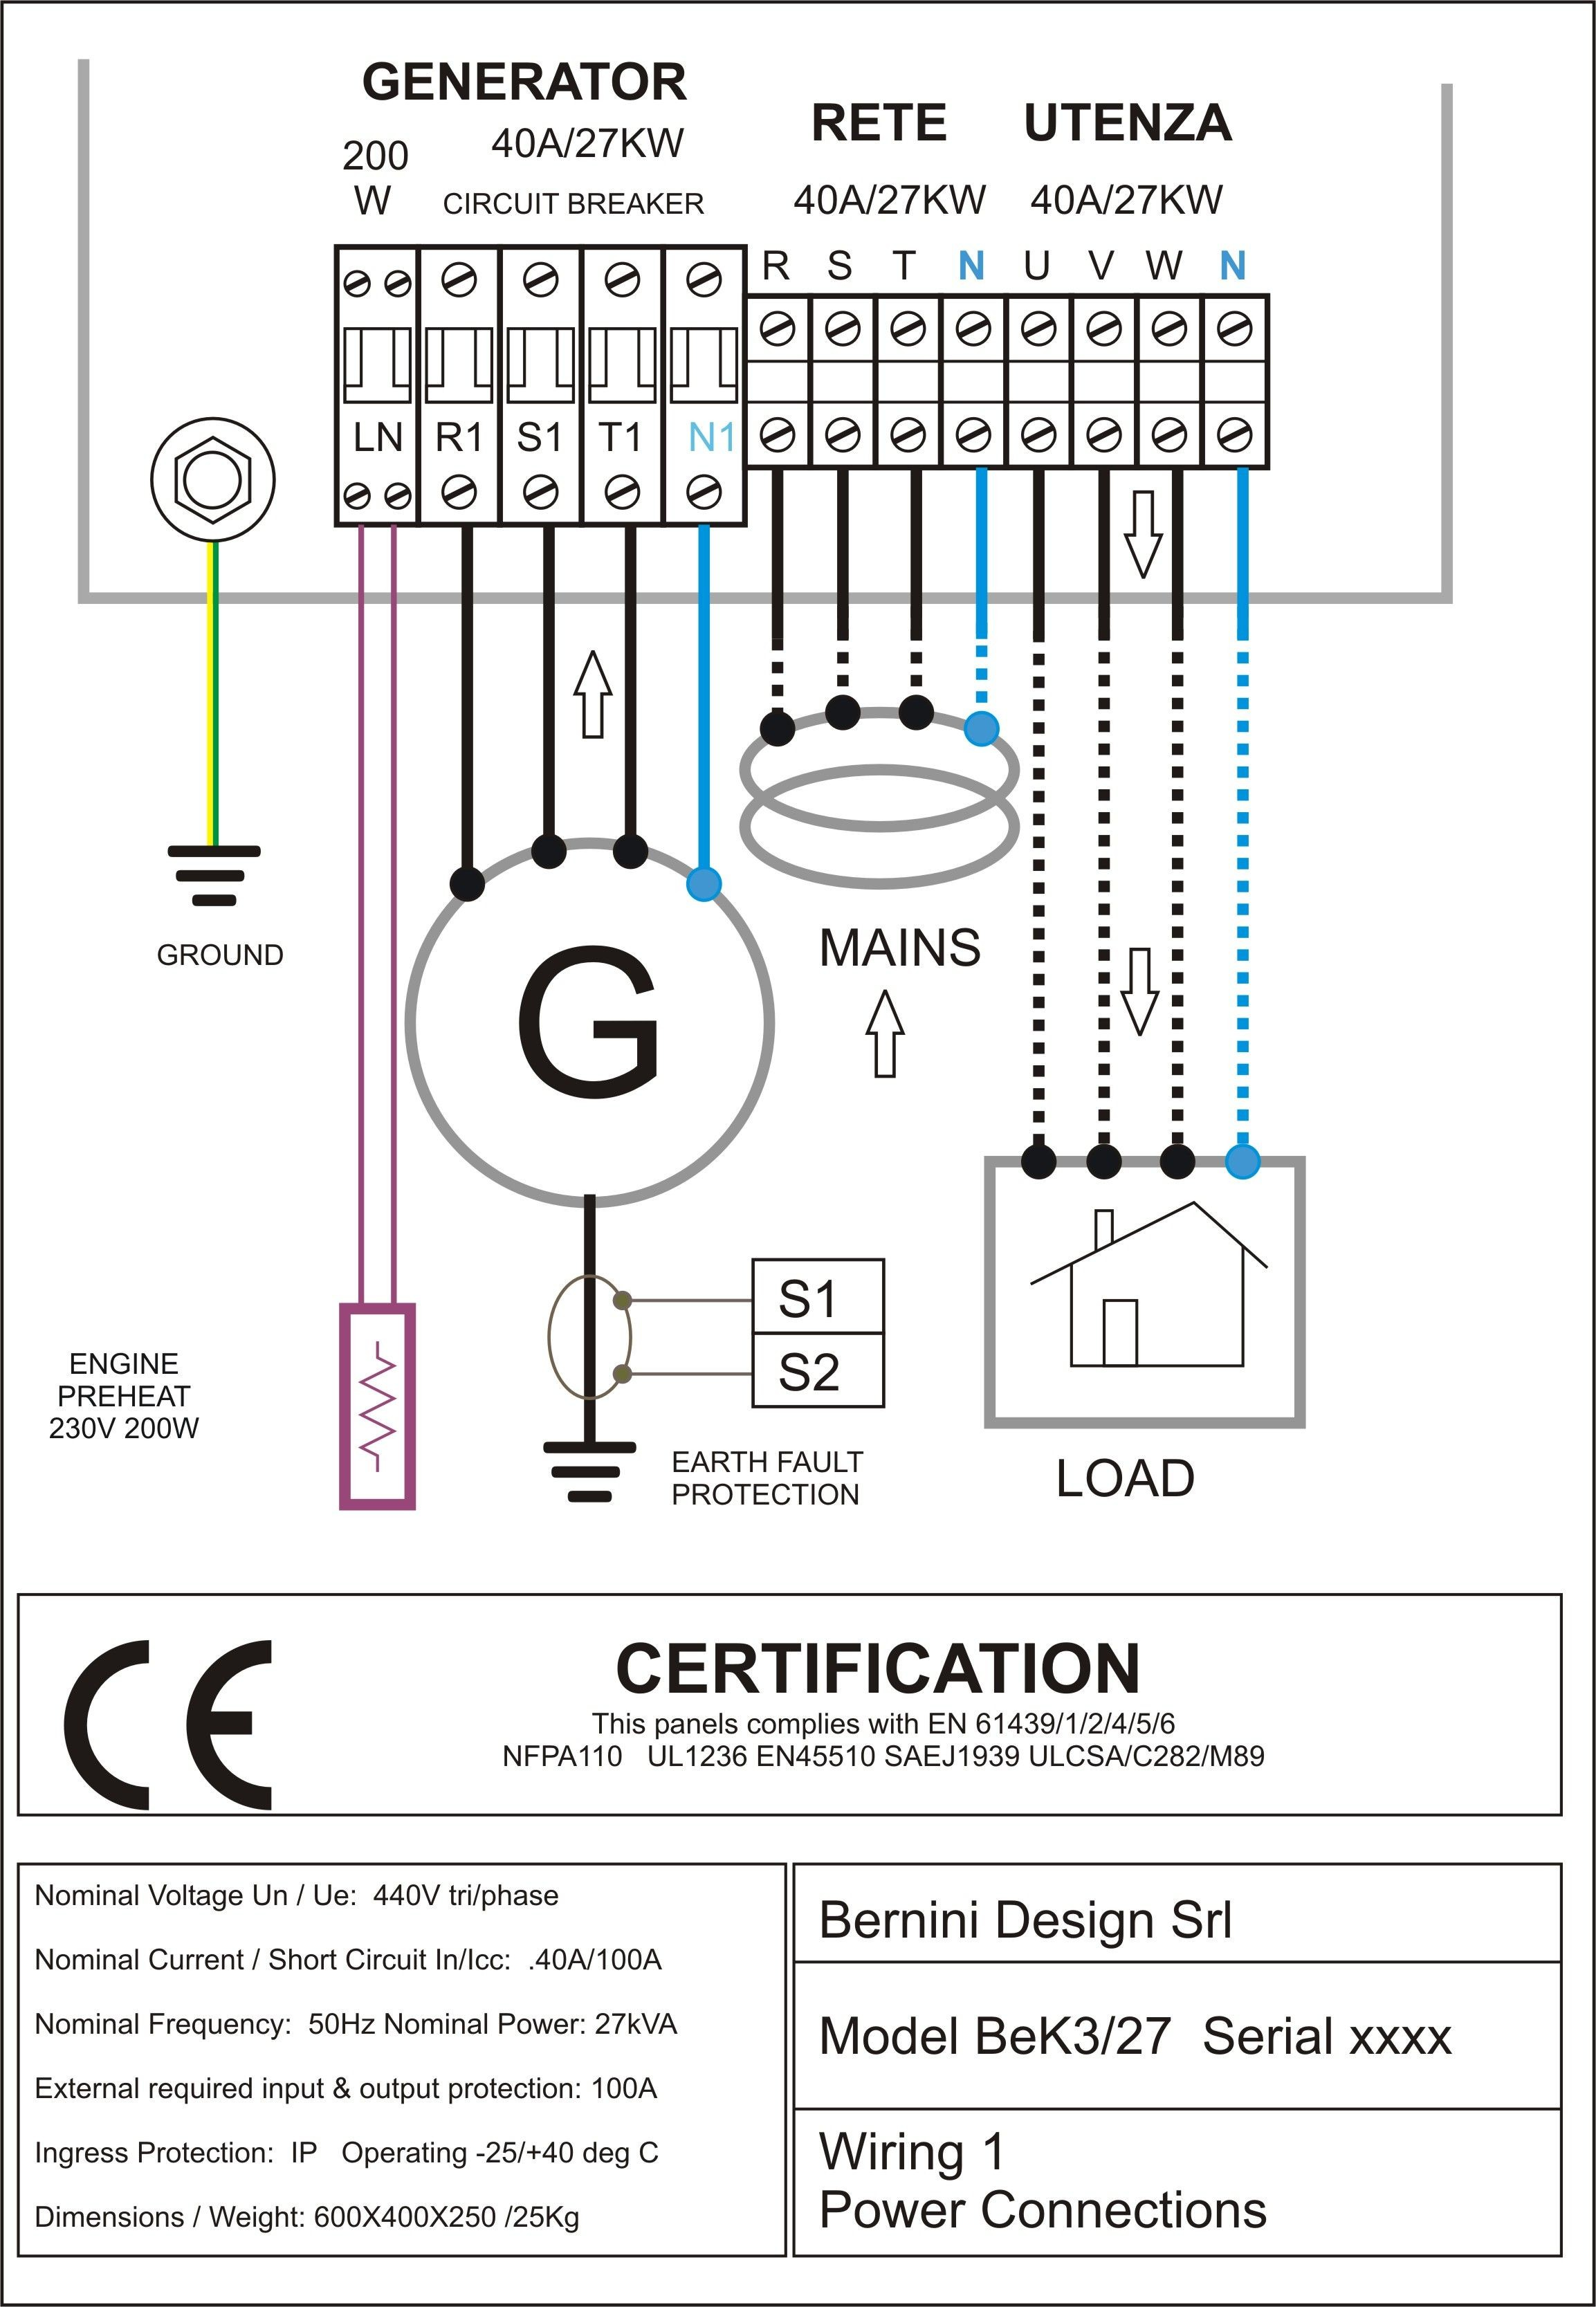 Car Ac Diagram Sel Generator Control Panel Wiring Diagram Ac Connections Of Car Ac Diagram